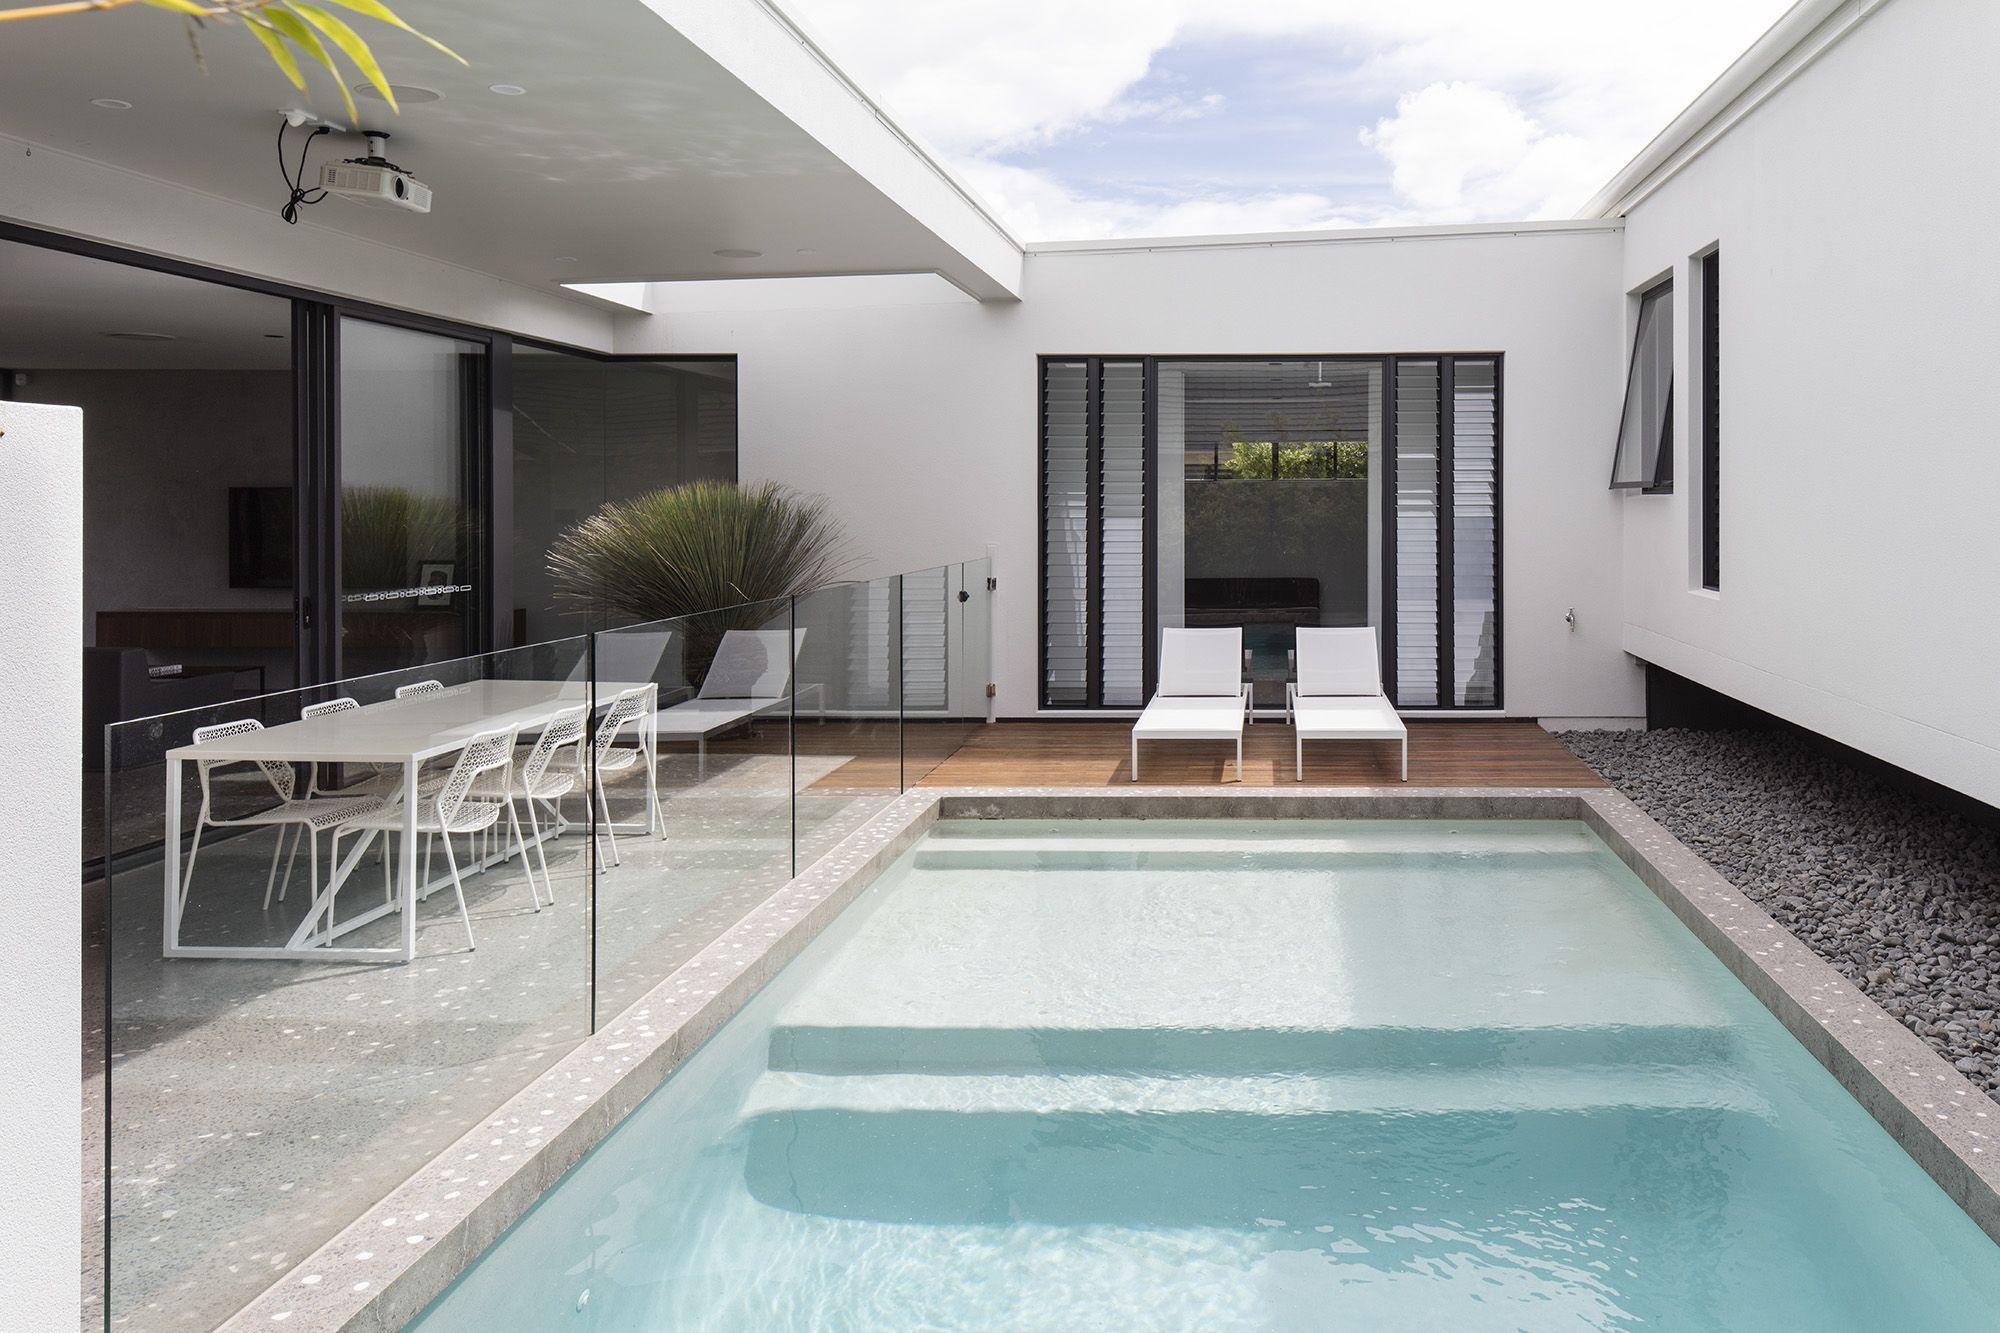 Custom swimming pool idea by immackulate designer homes the peregian springs project located on sunshine coast qld australia also rh pinterest